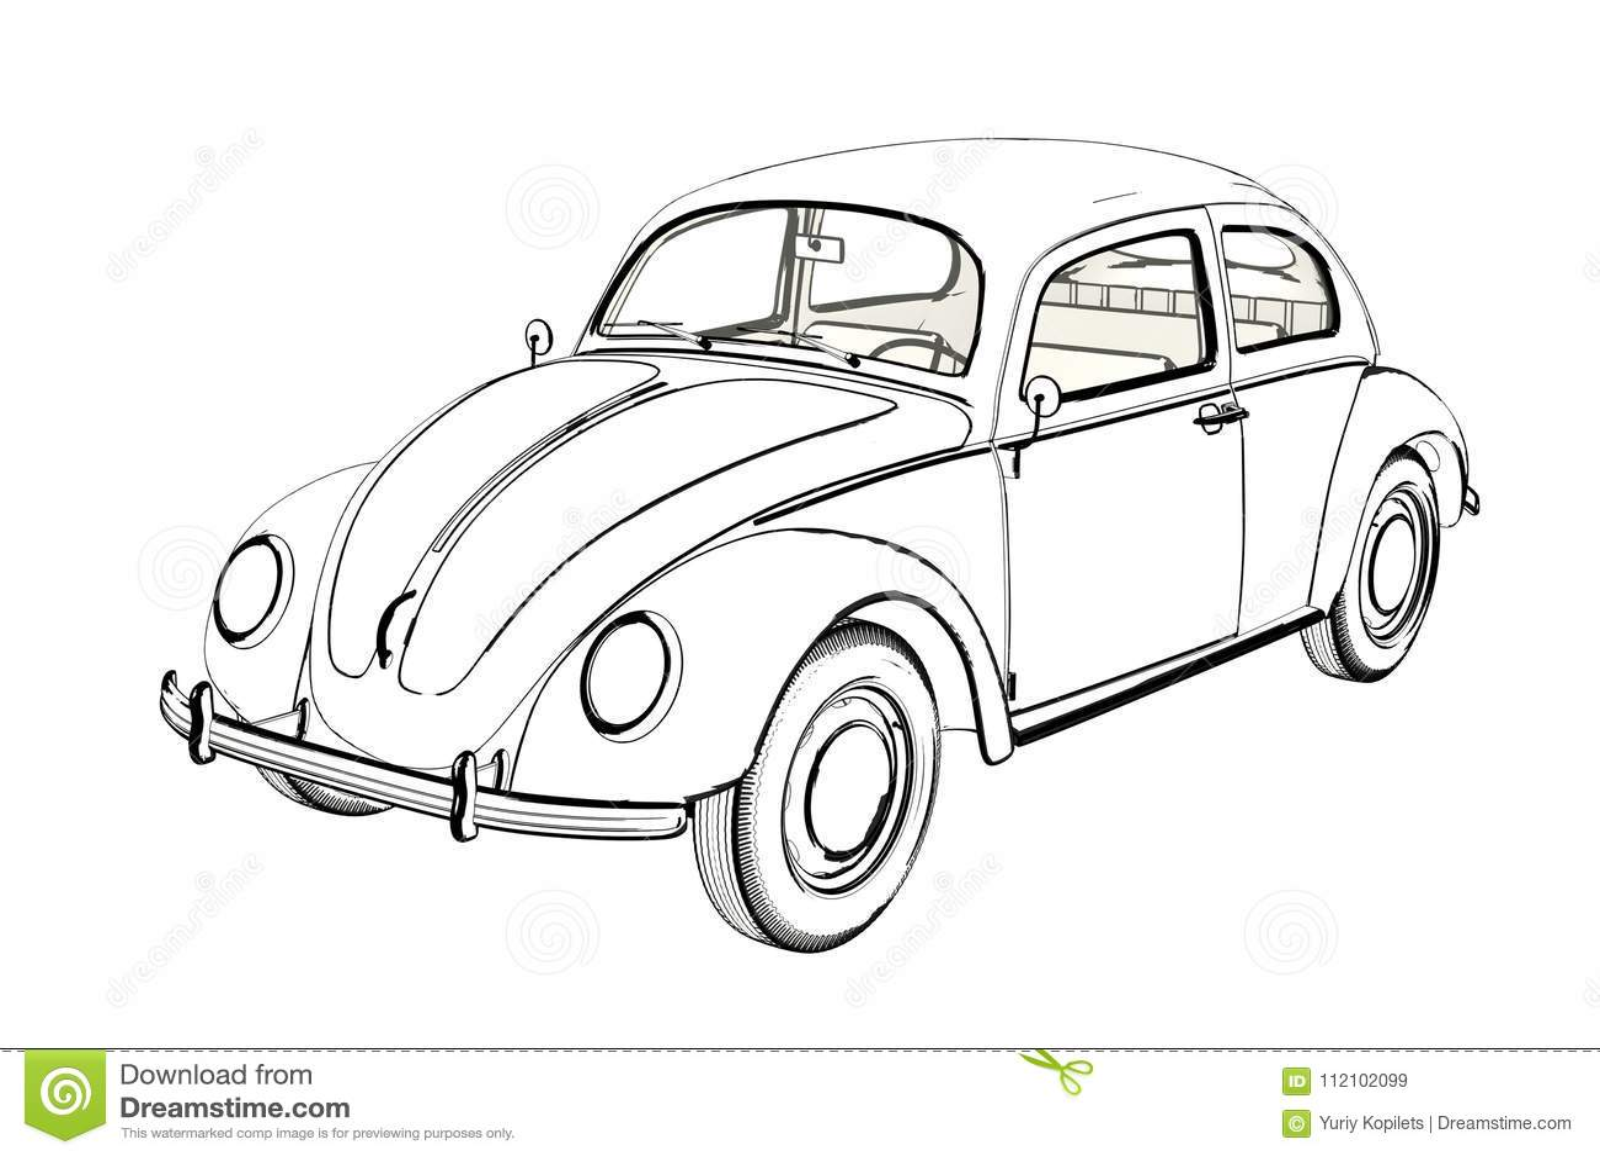 Sprot Car Wolksvagen Beetle Sketch 3d Illustration Stock